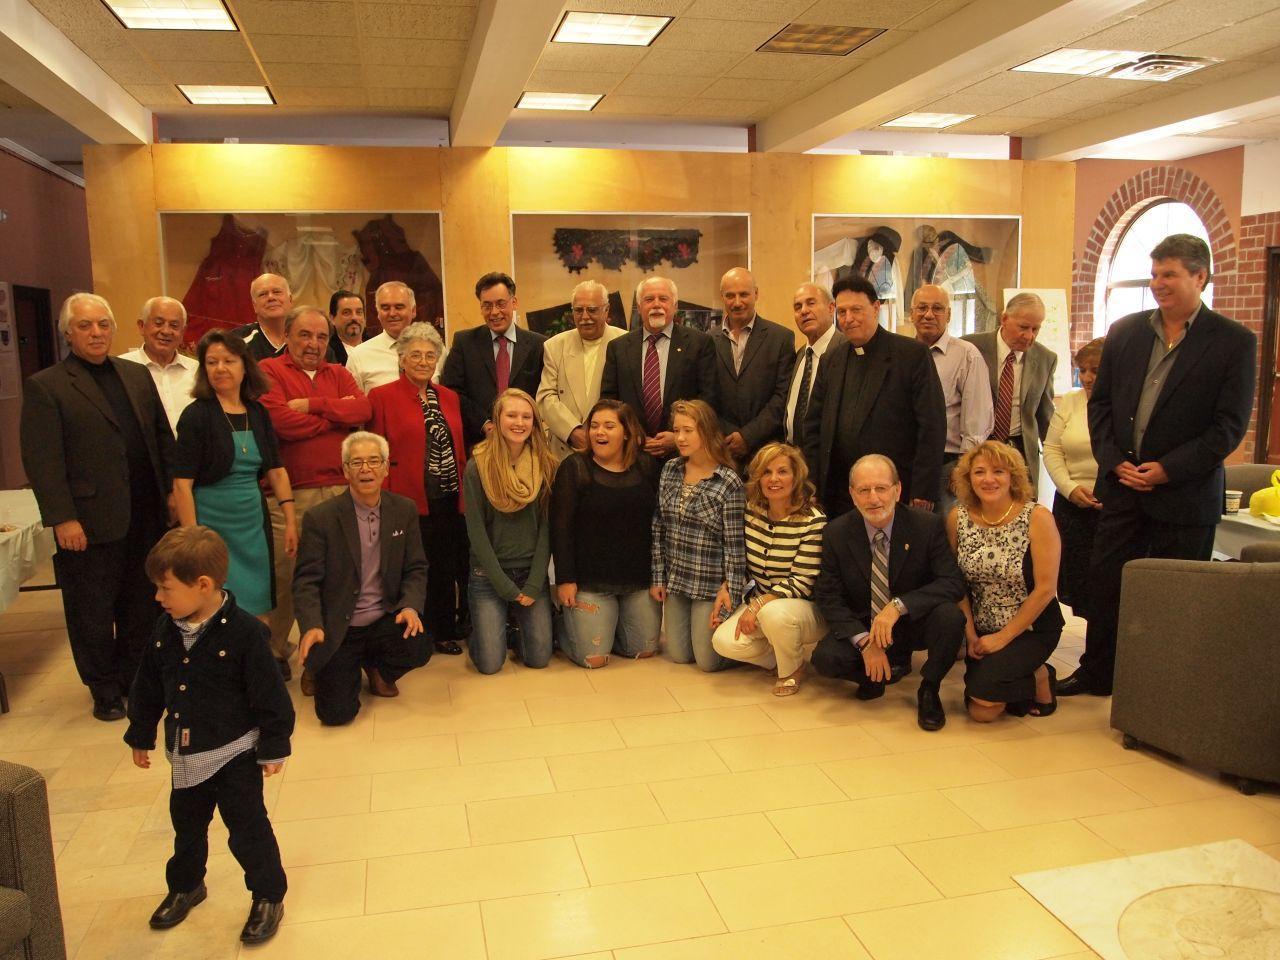 HANC's President visits Paideia Organization at UCONN